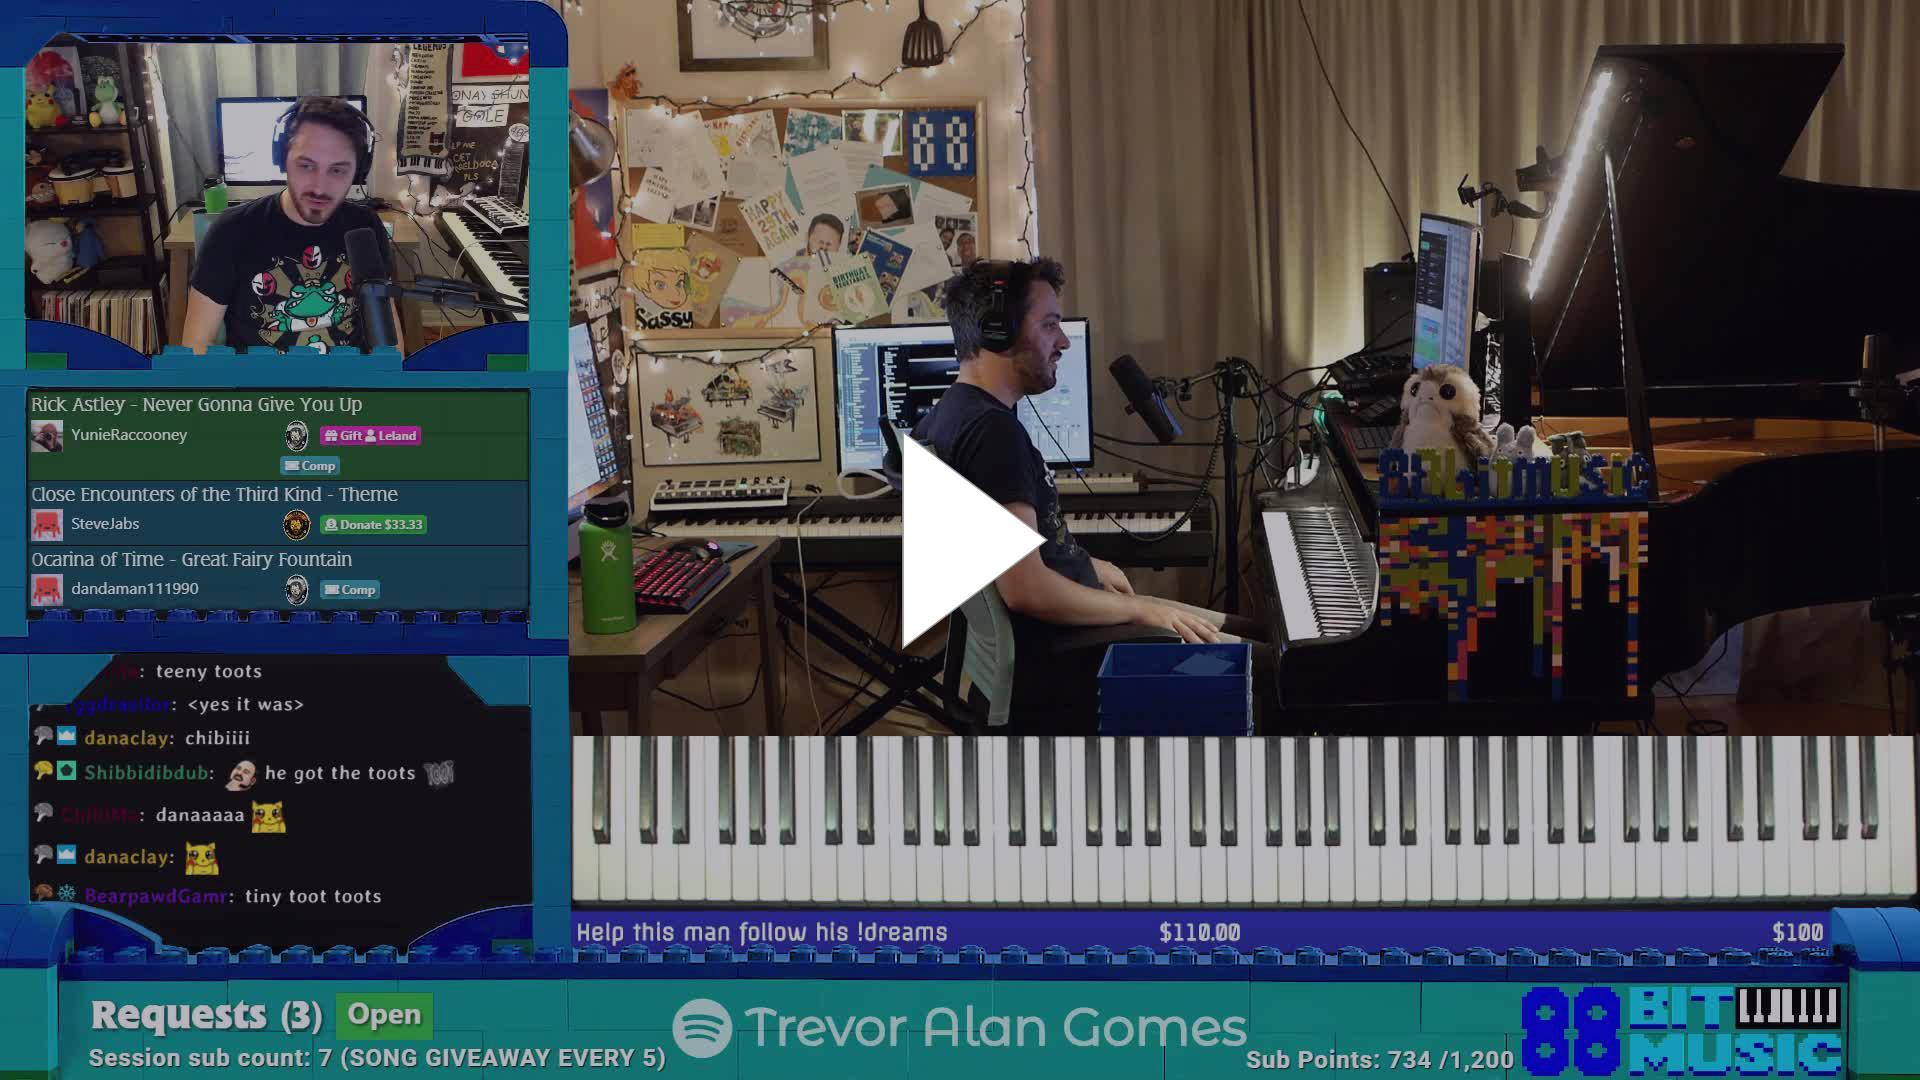 88bitmusic - Proper Rickrolling - Twitch